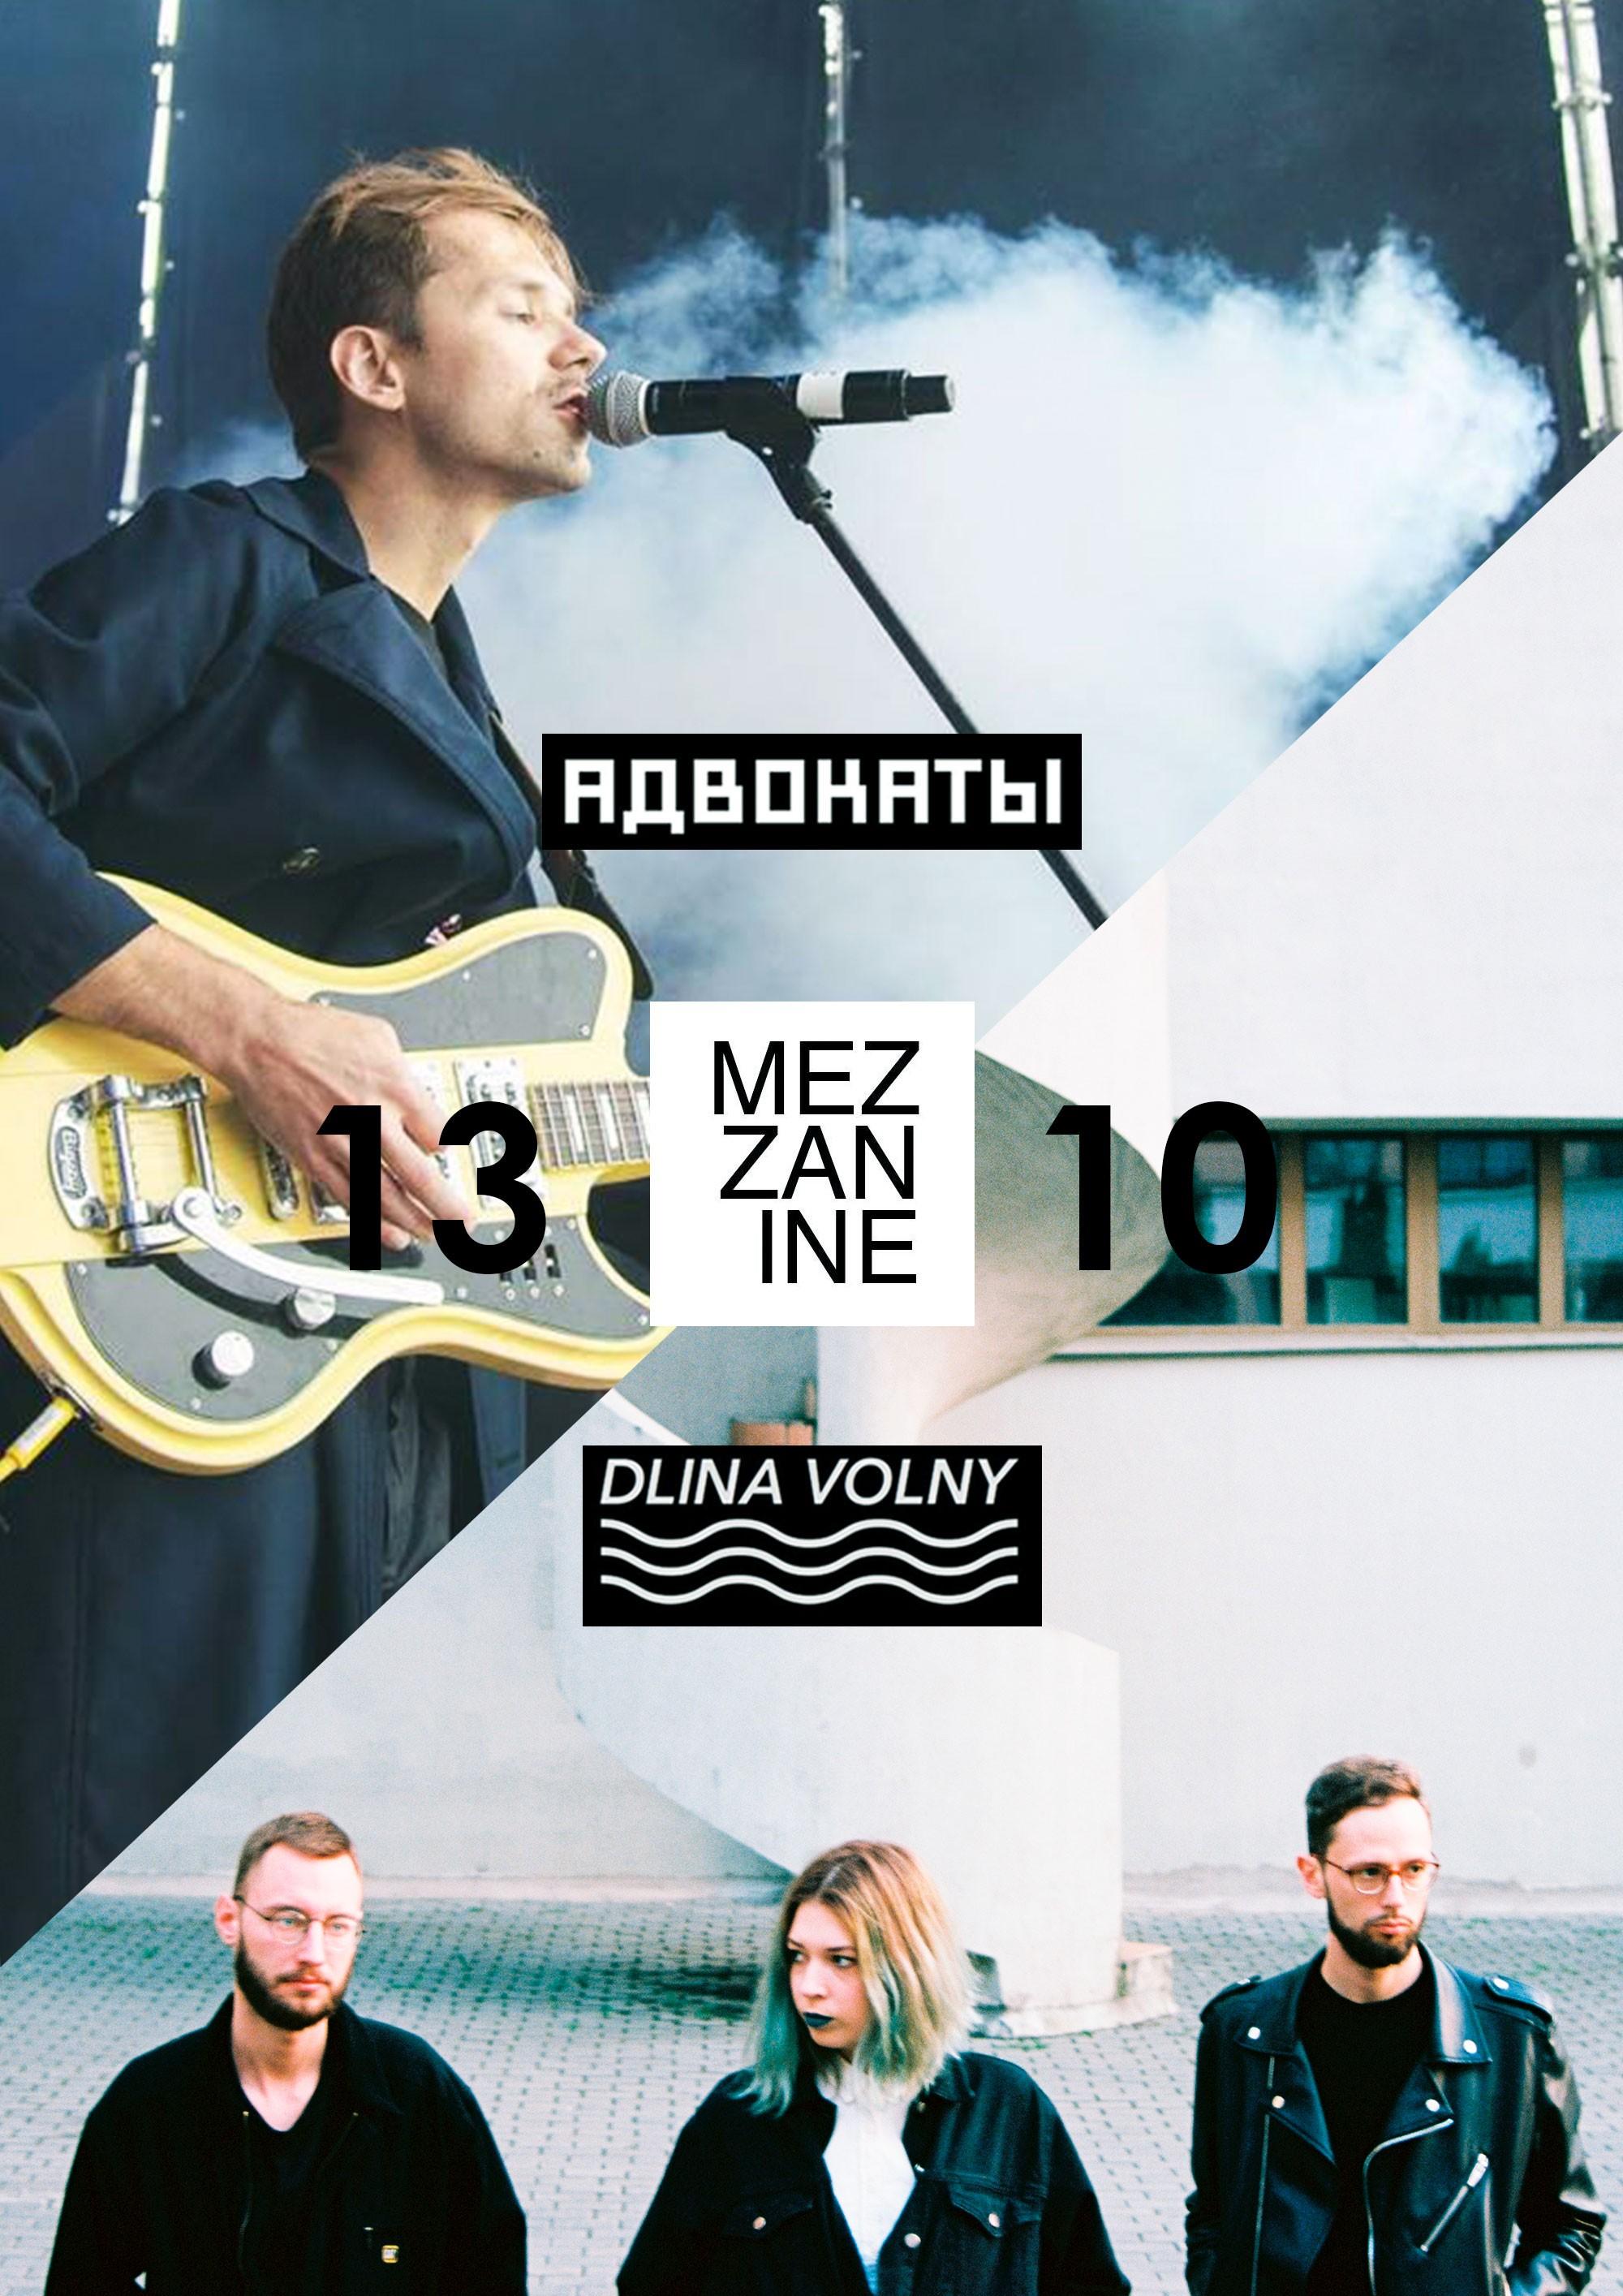 Билеты Адвокаты + Dlina Volny (BY) 13.10 Mezzanine